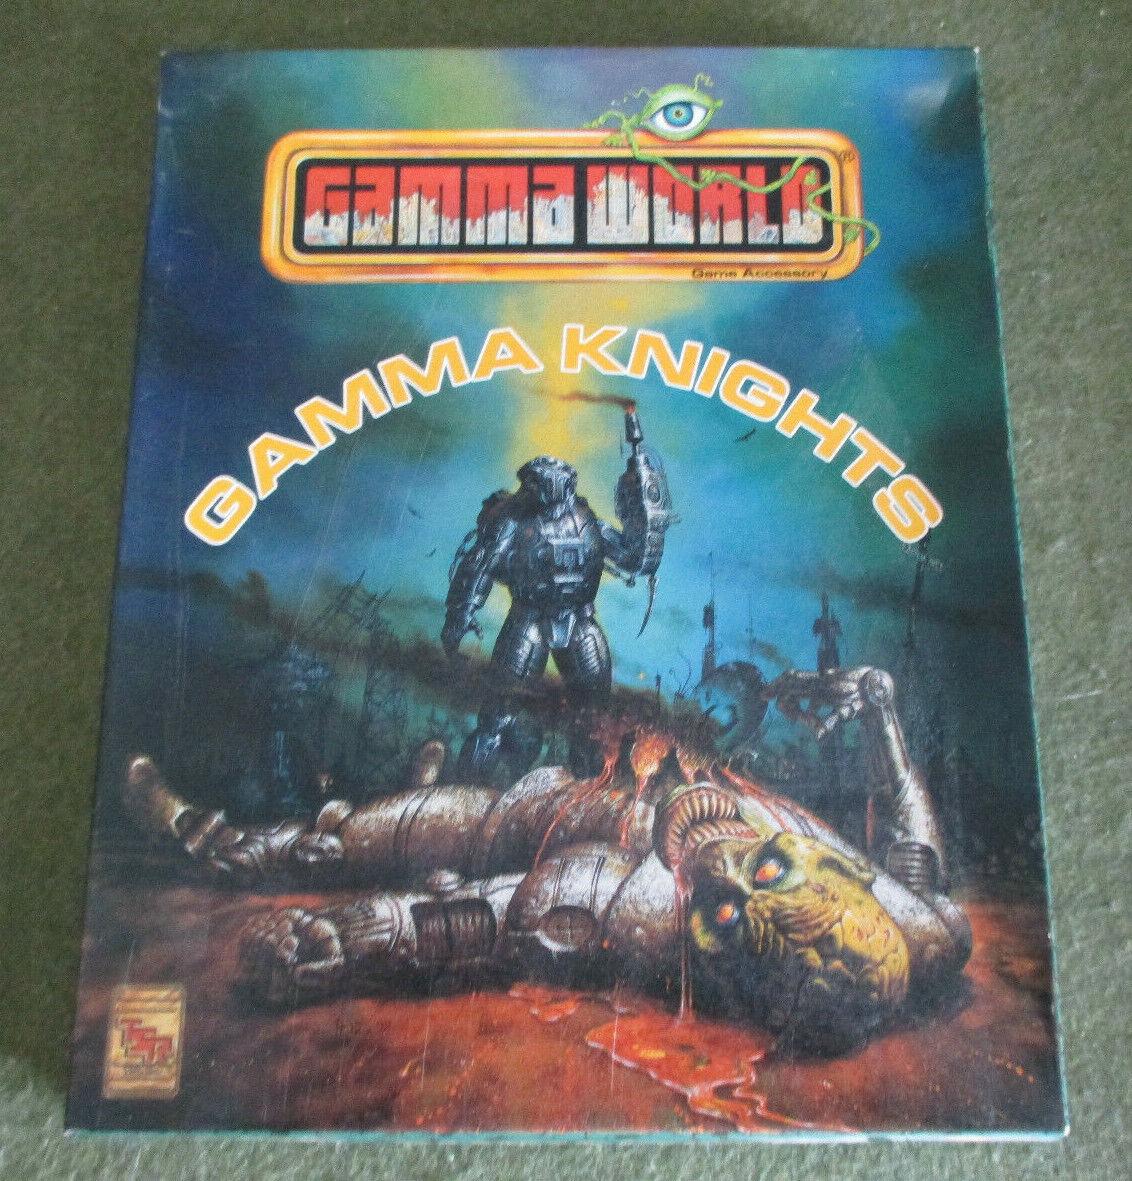 TSR, Gamma mundo Rpg-Gamma Caballeros Conjunto en caja (1992) (sin usar ENLOMADOR)